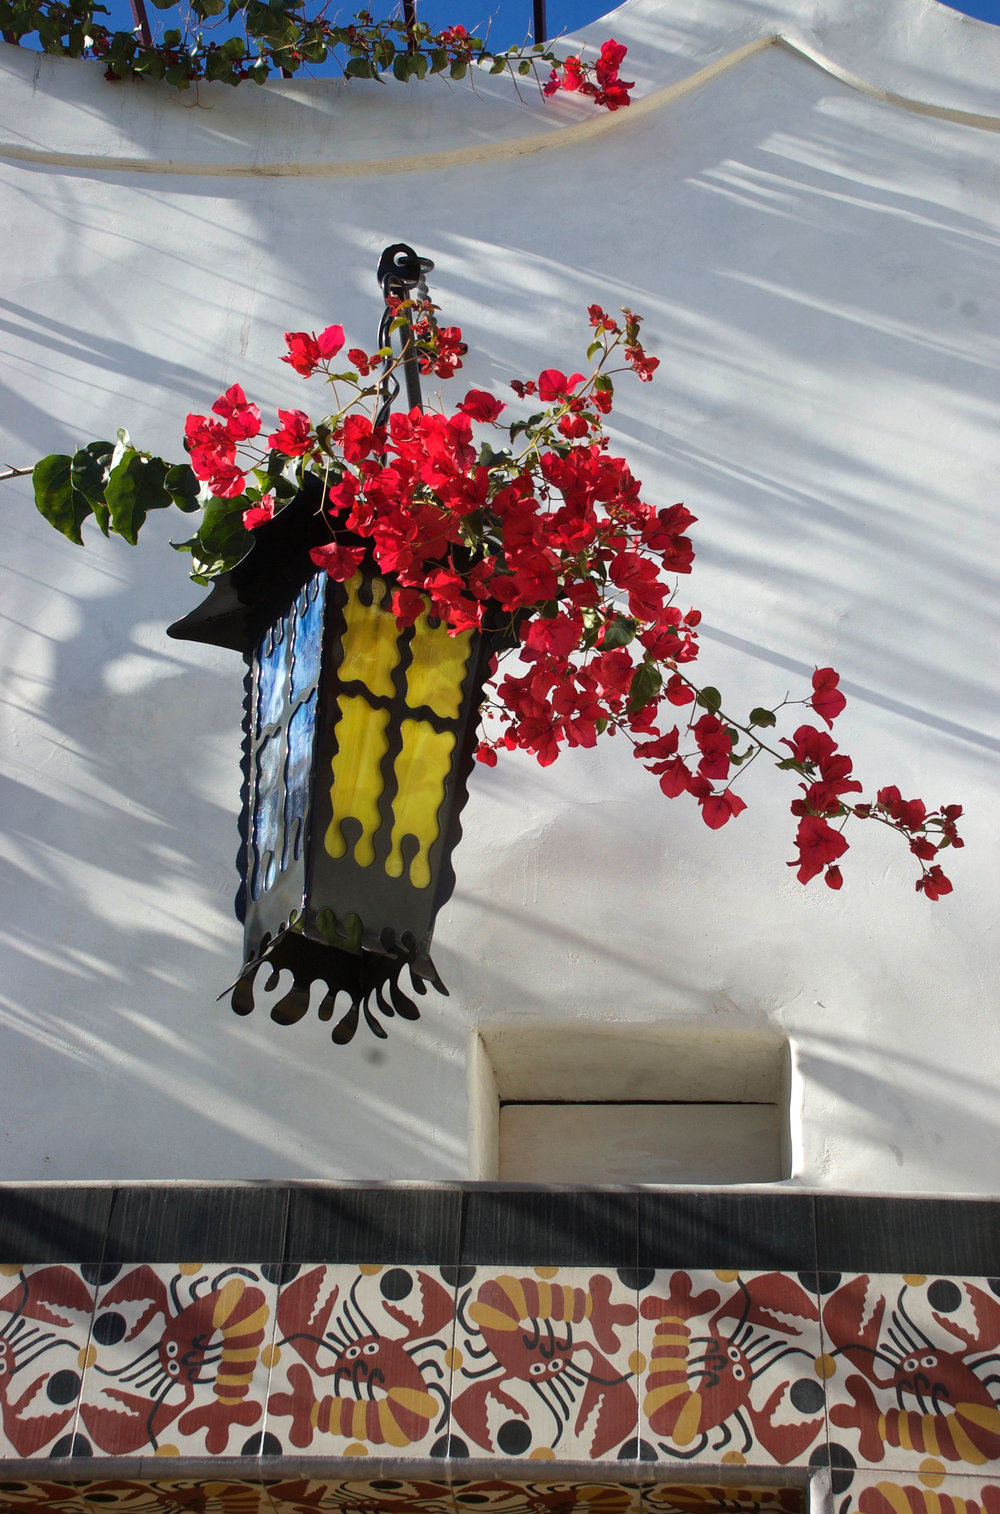 lamp & bougainvillea.jpg